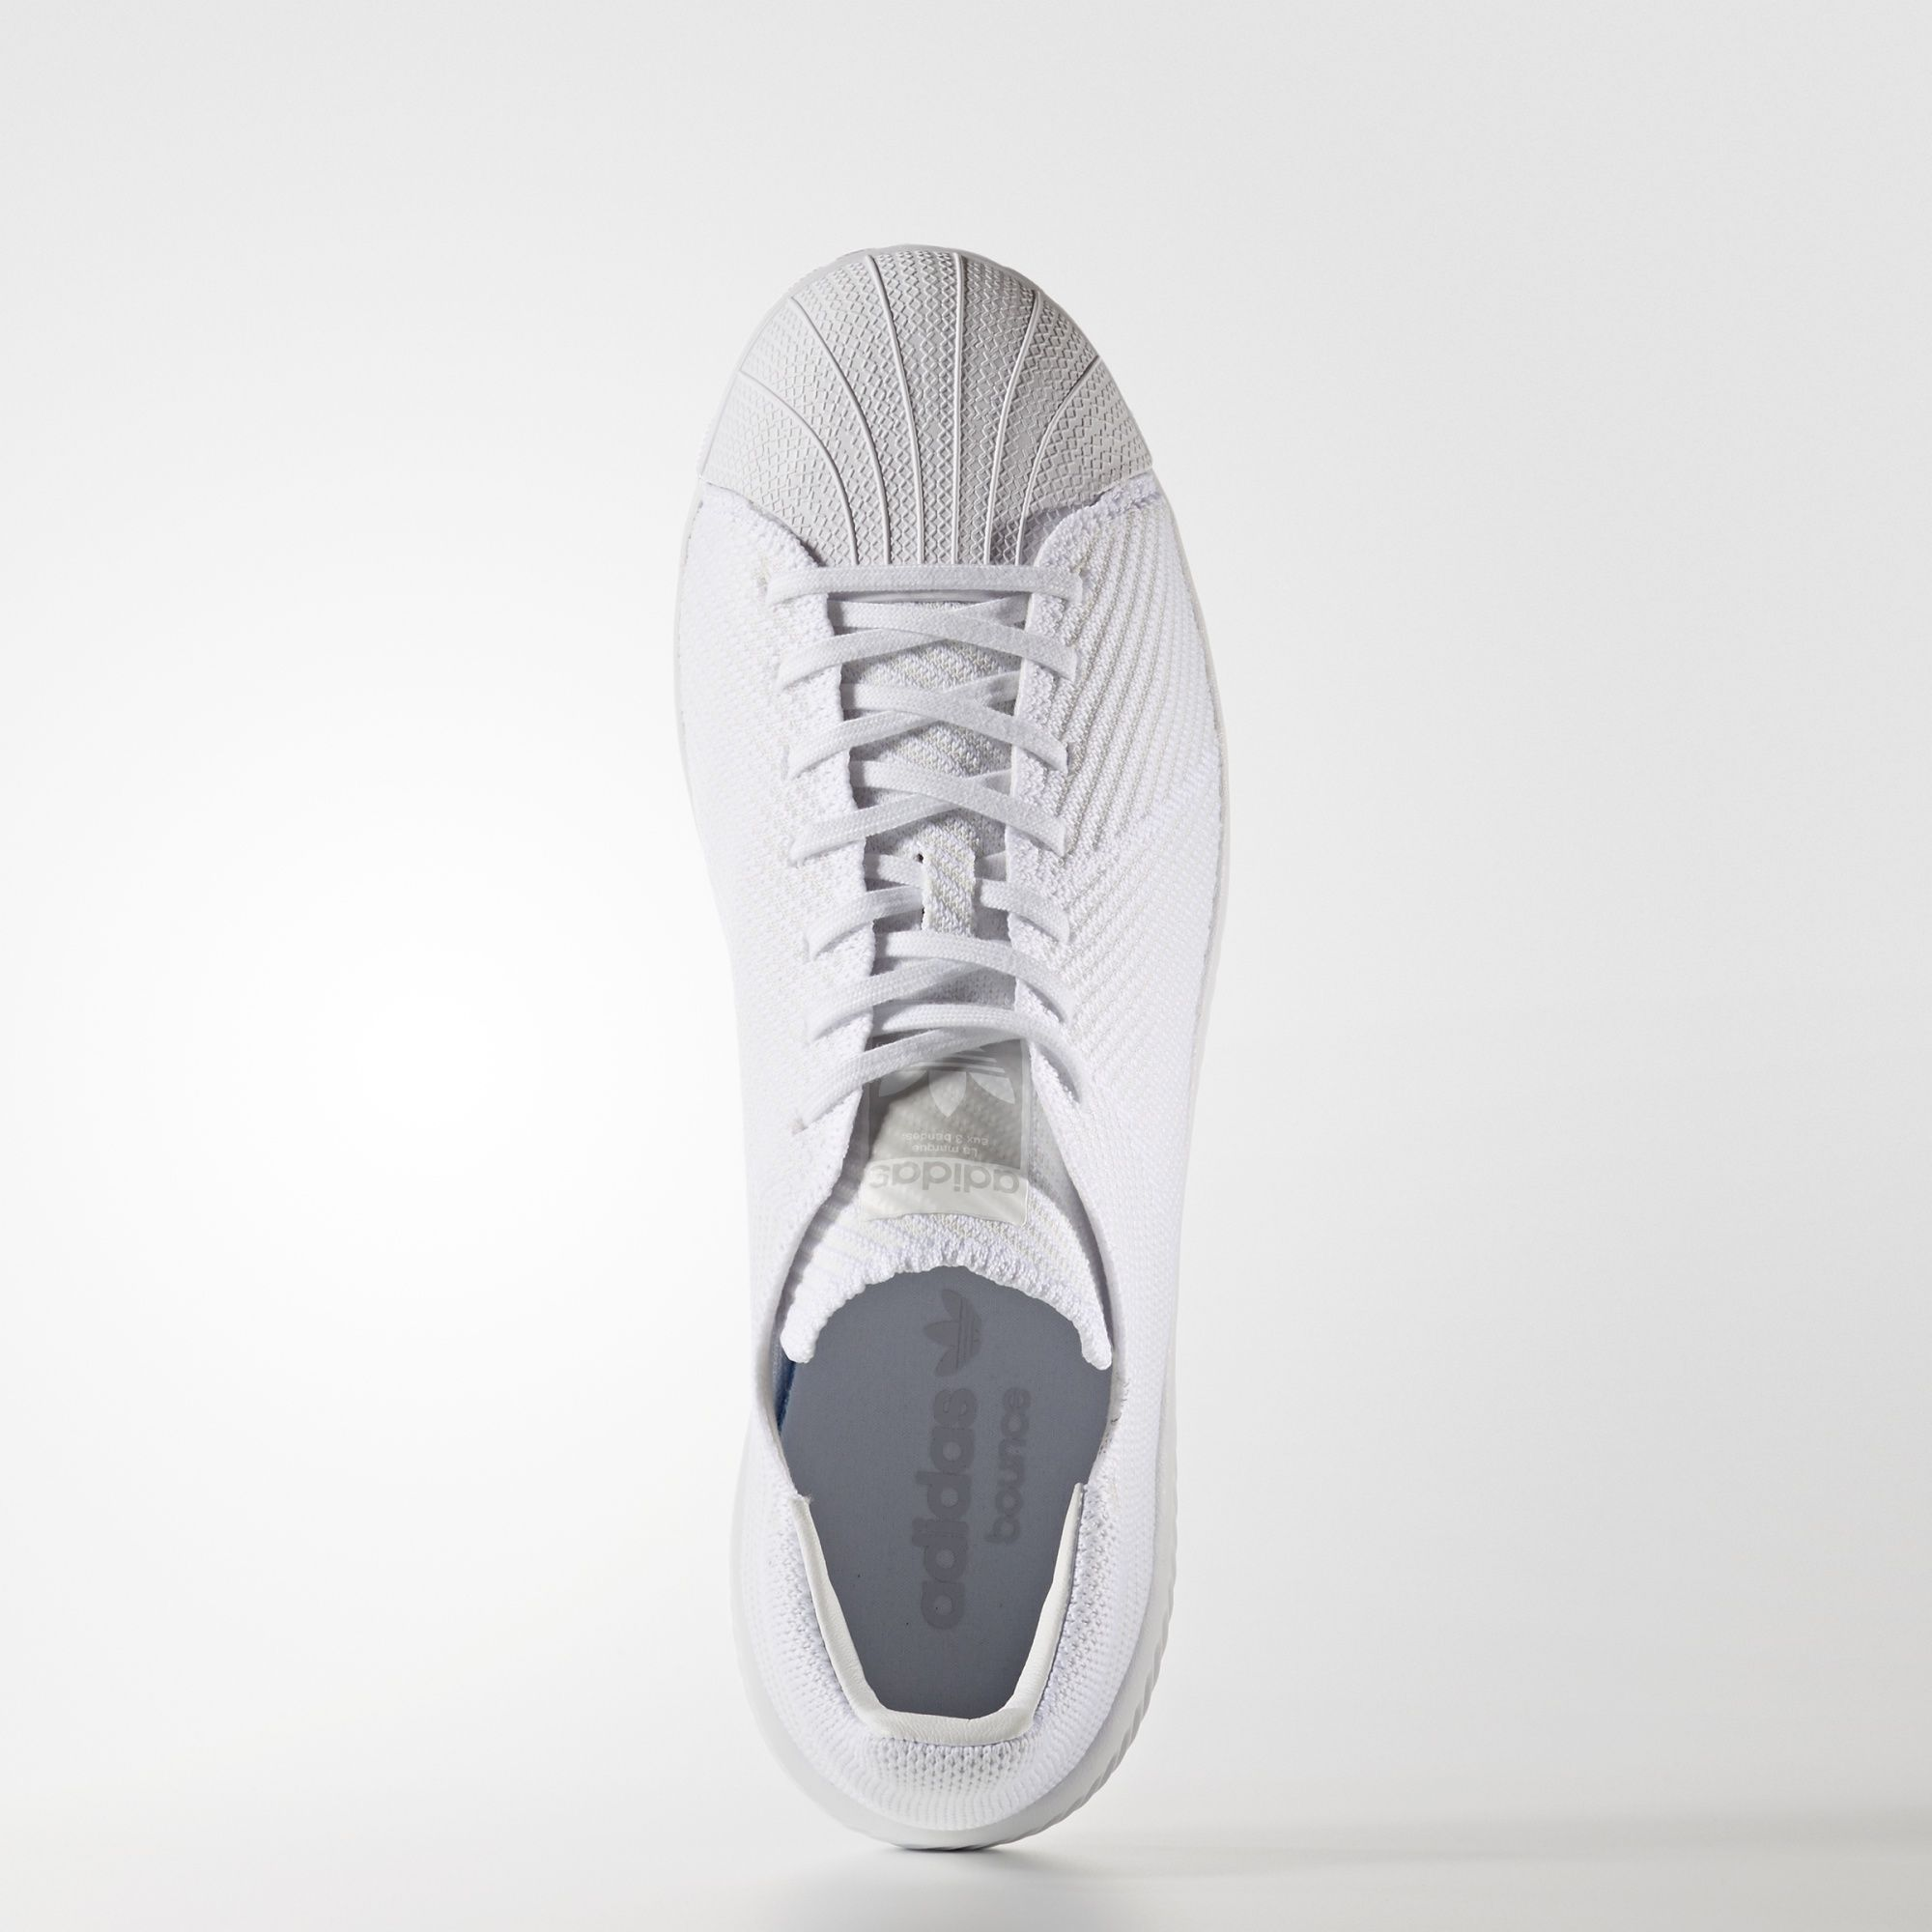 adidas Superstar Bounce PK 2